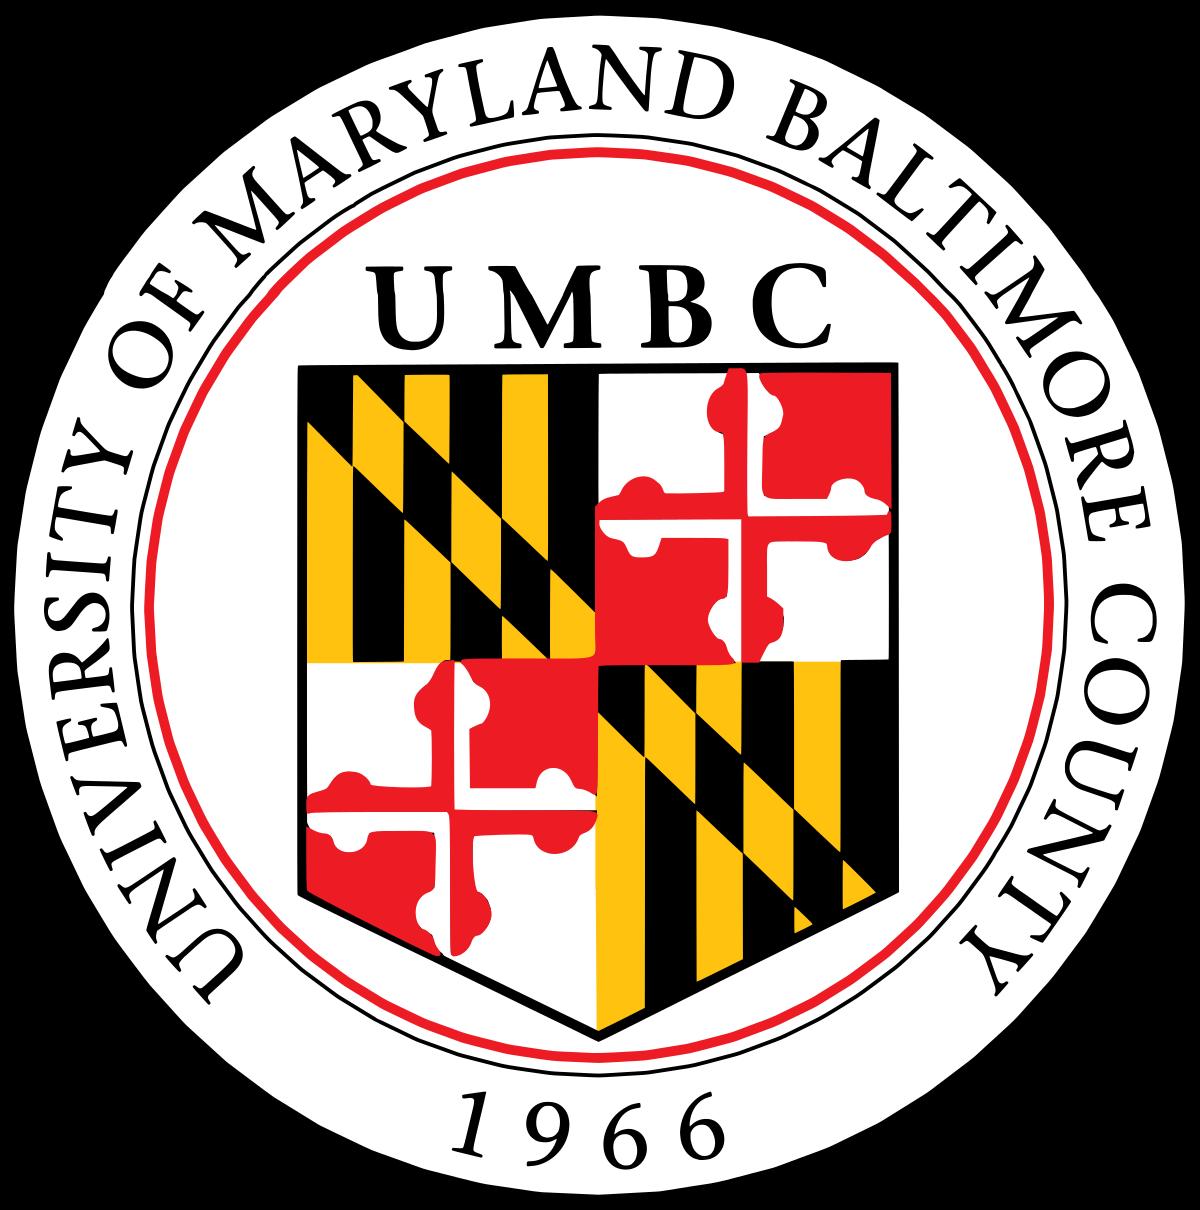 College: University of Maryland.